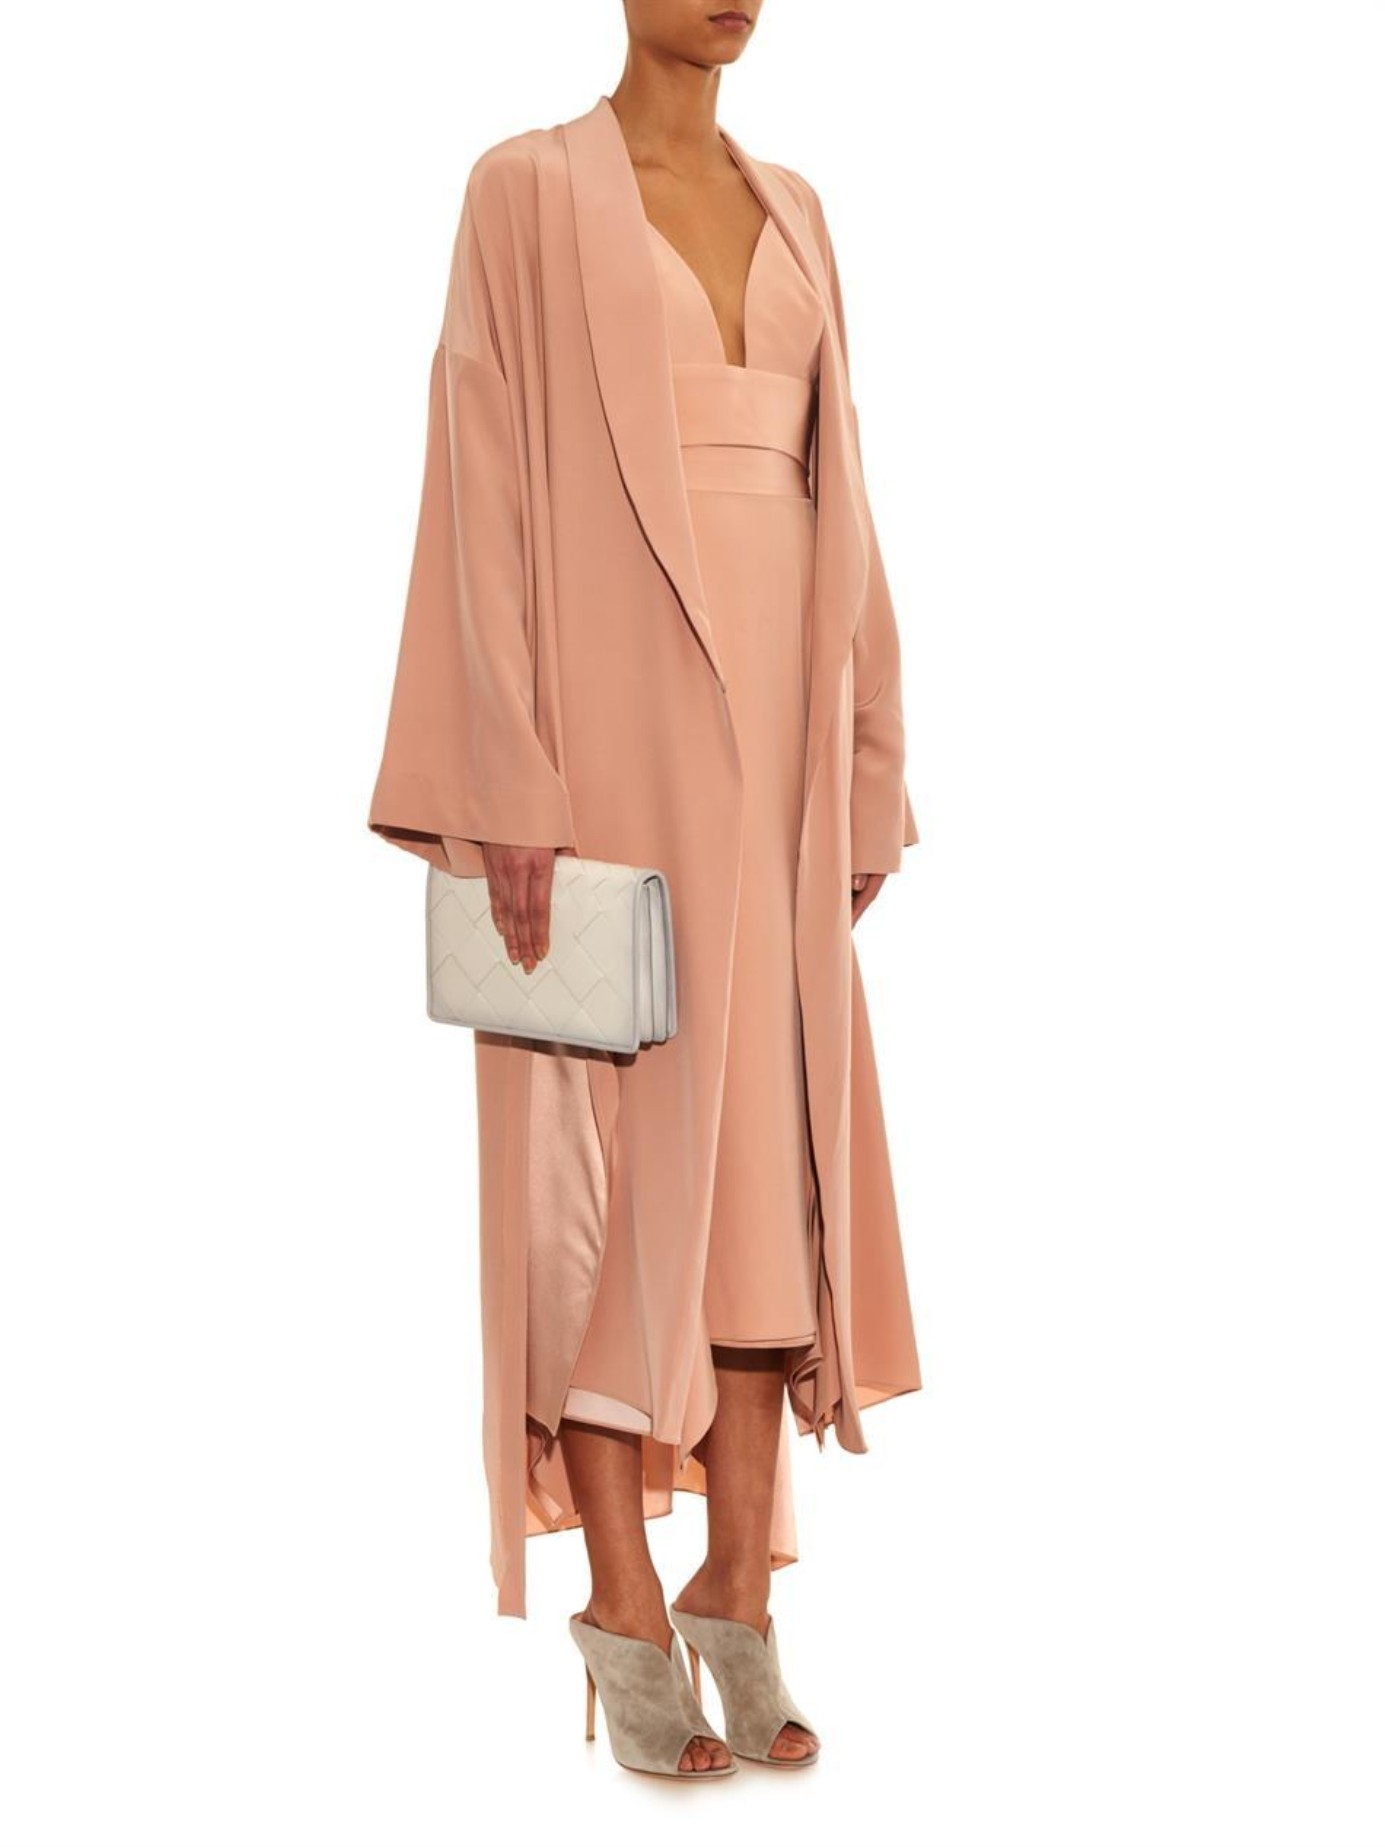 juan carlos obando shawl lapel coat in natural lyst. Black Bedroom Furniture Sets. Home Design Ideas